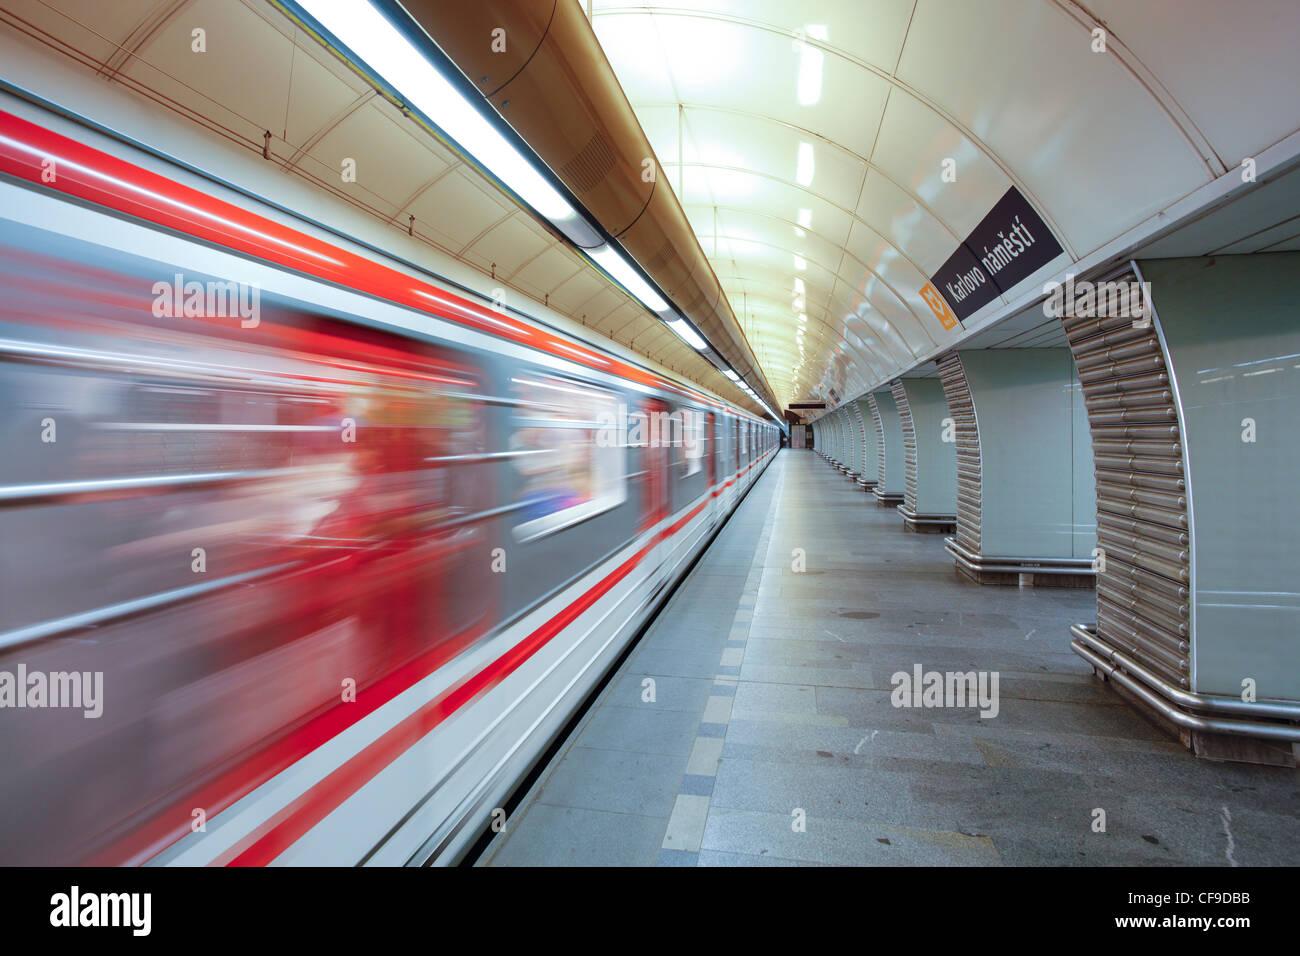 Train arriving at a platform in Prague underground Metro, blurred motion, Prague, Czech Republic - Stock Image